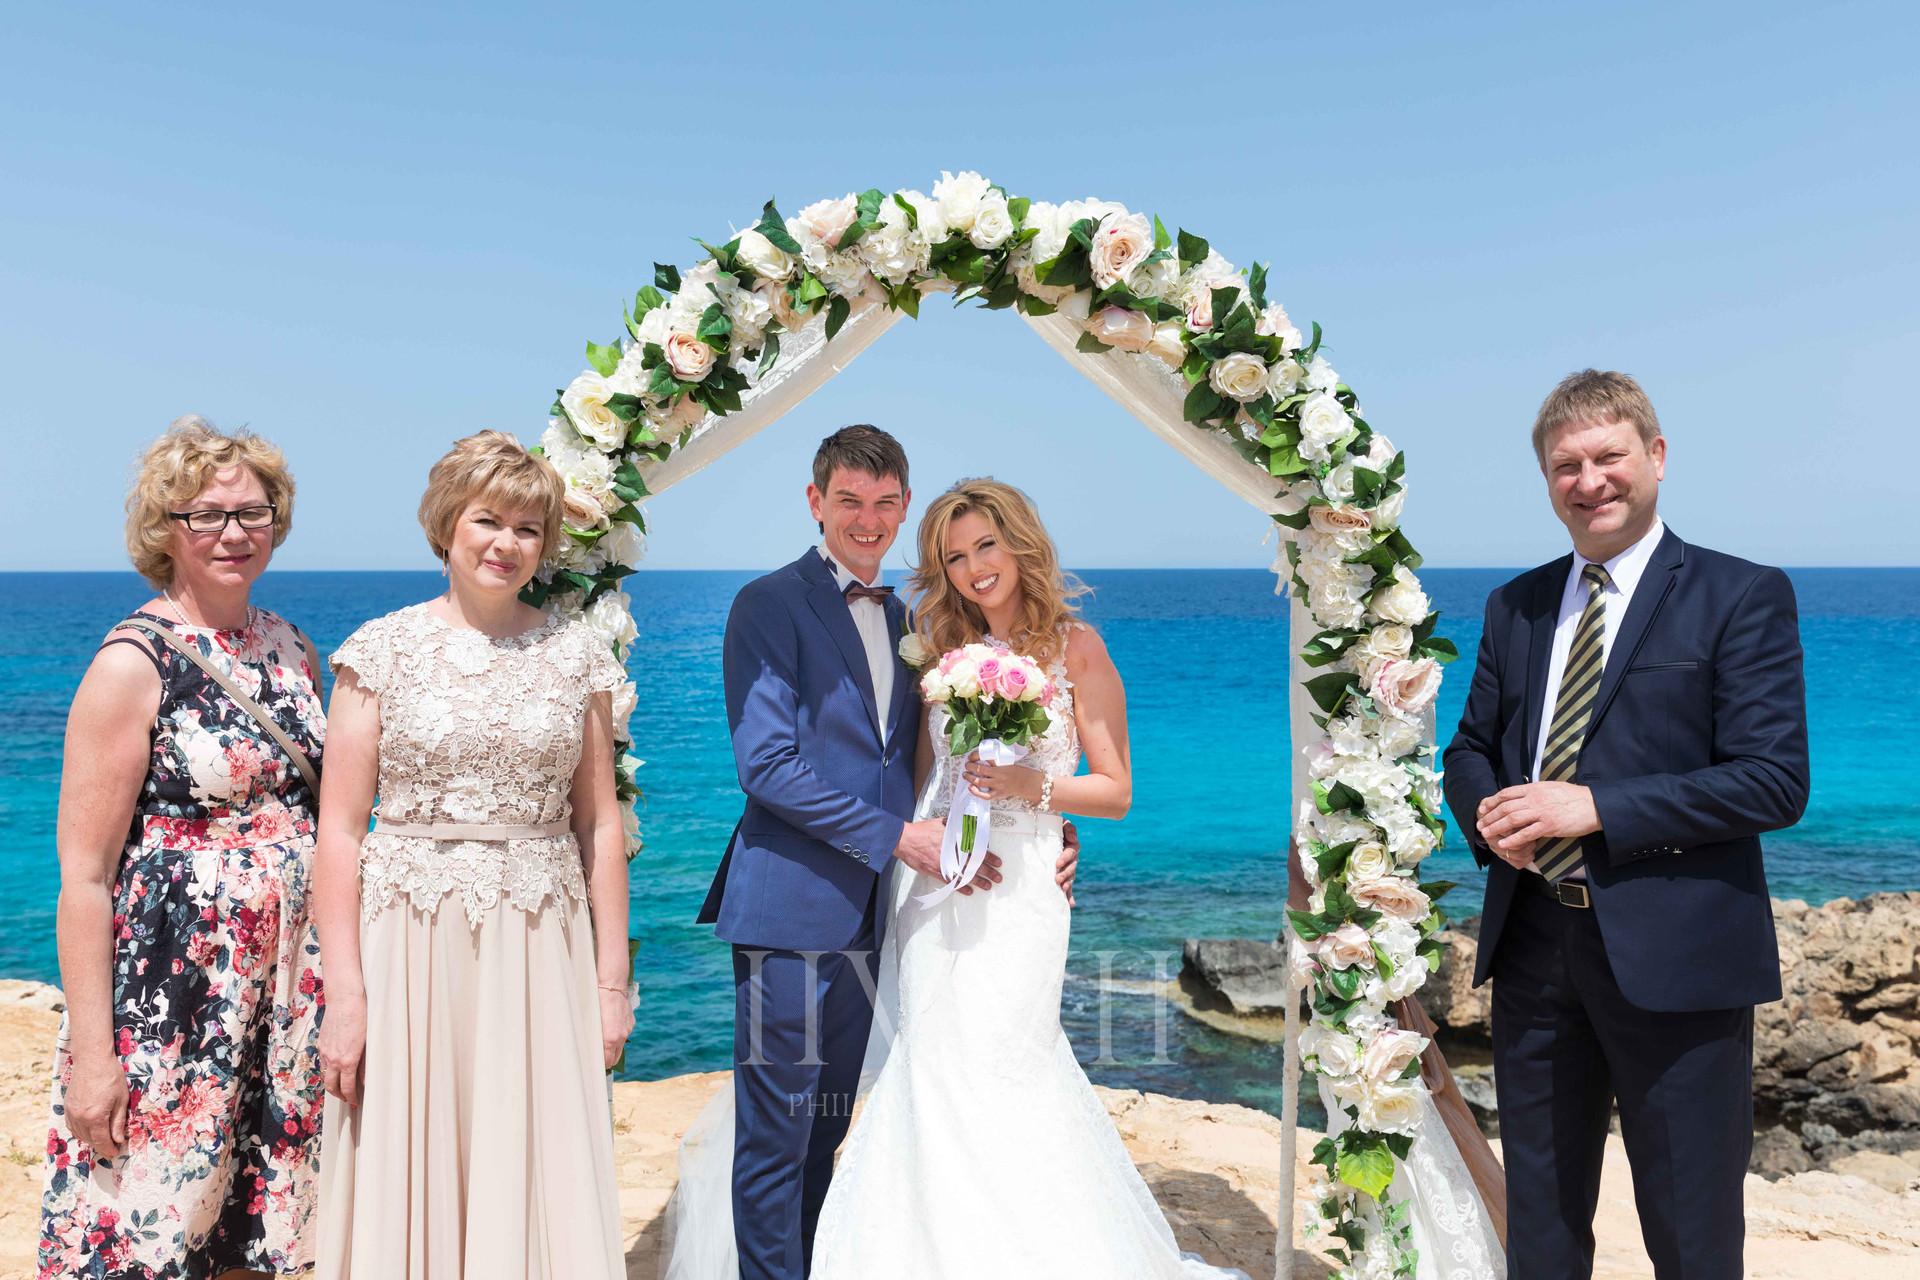 Gintare and Albertui Wedding-19.jpg